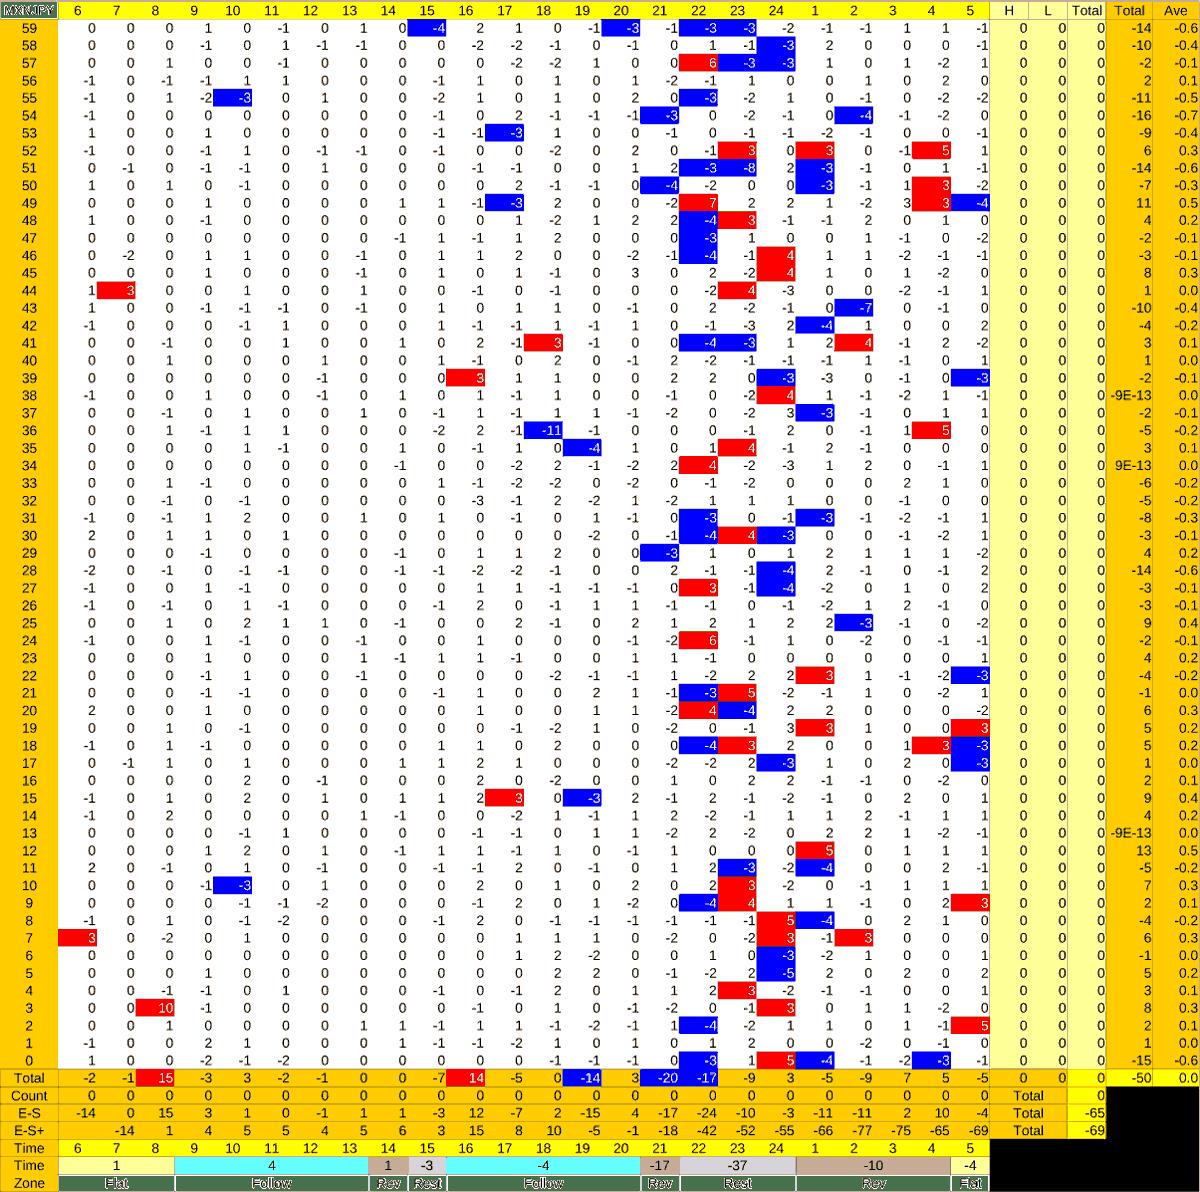 20210303_HS(3)MXNJPY